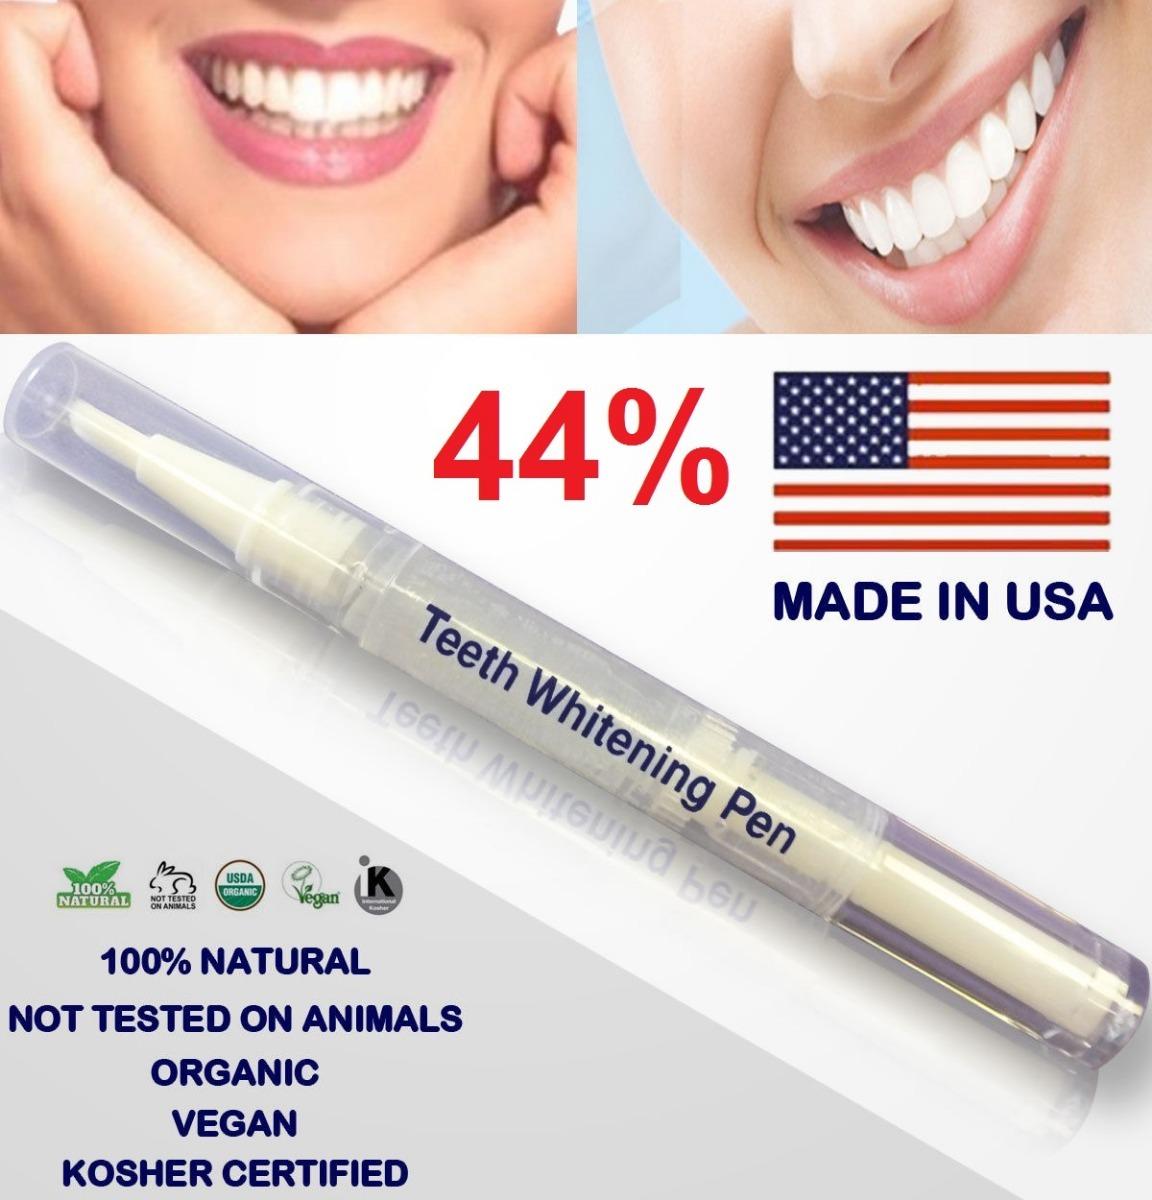 Caneta Clareador Dental Gel 44 Branqueadora Dentes Brancos R 19